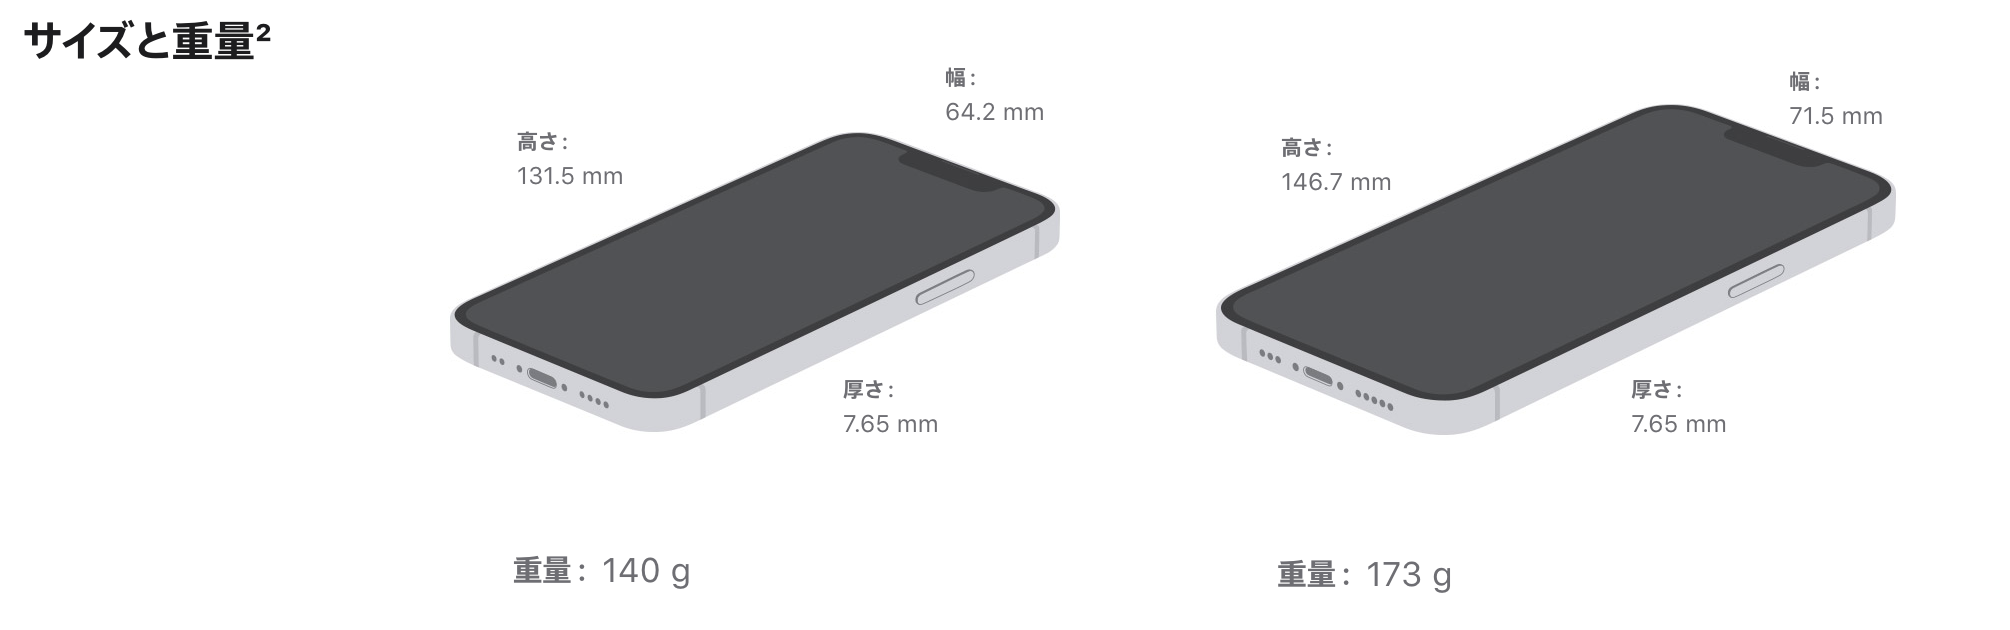 iPhone13のサイズ